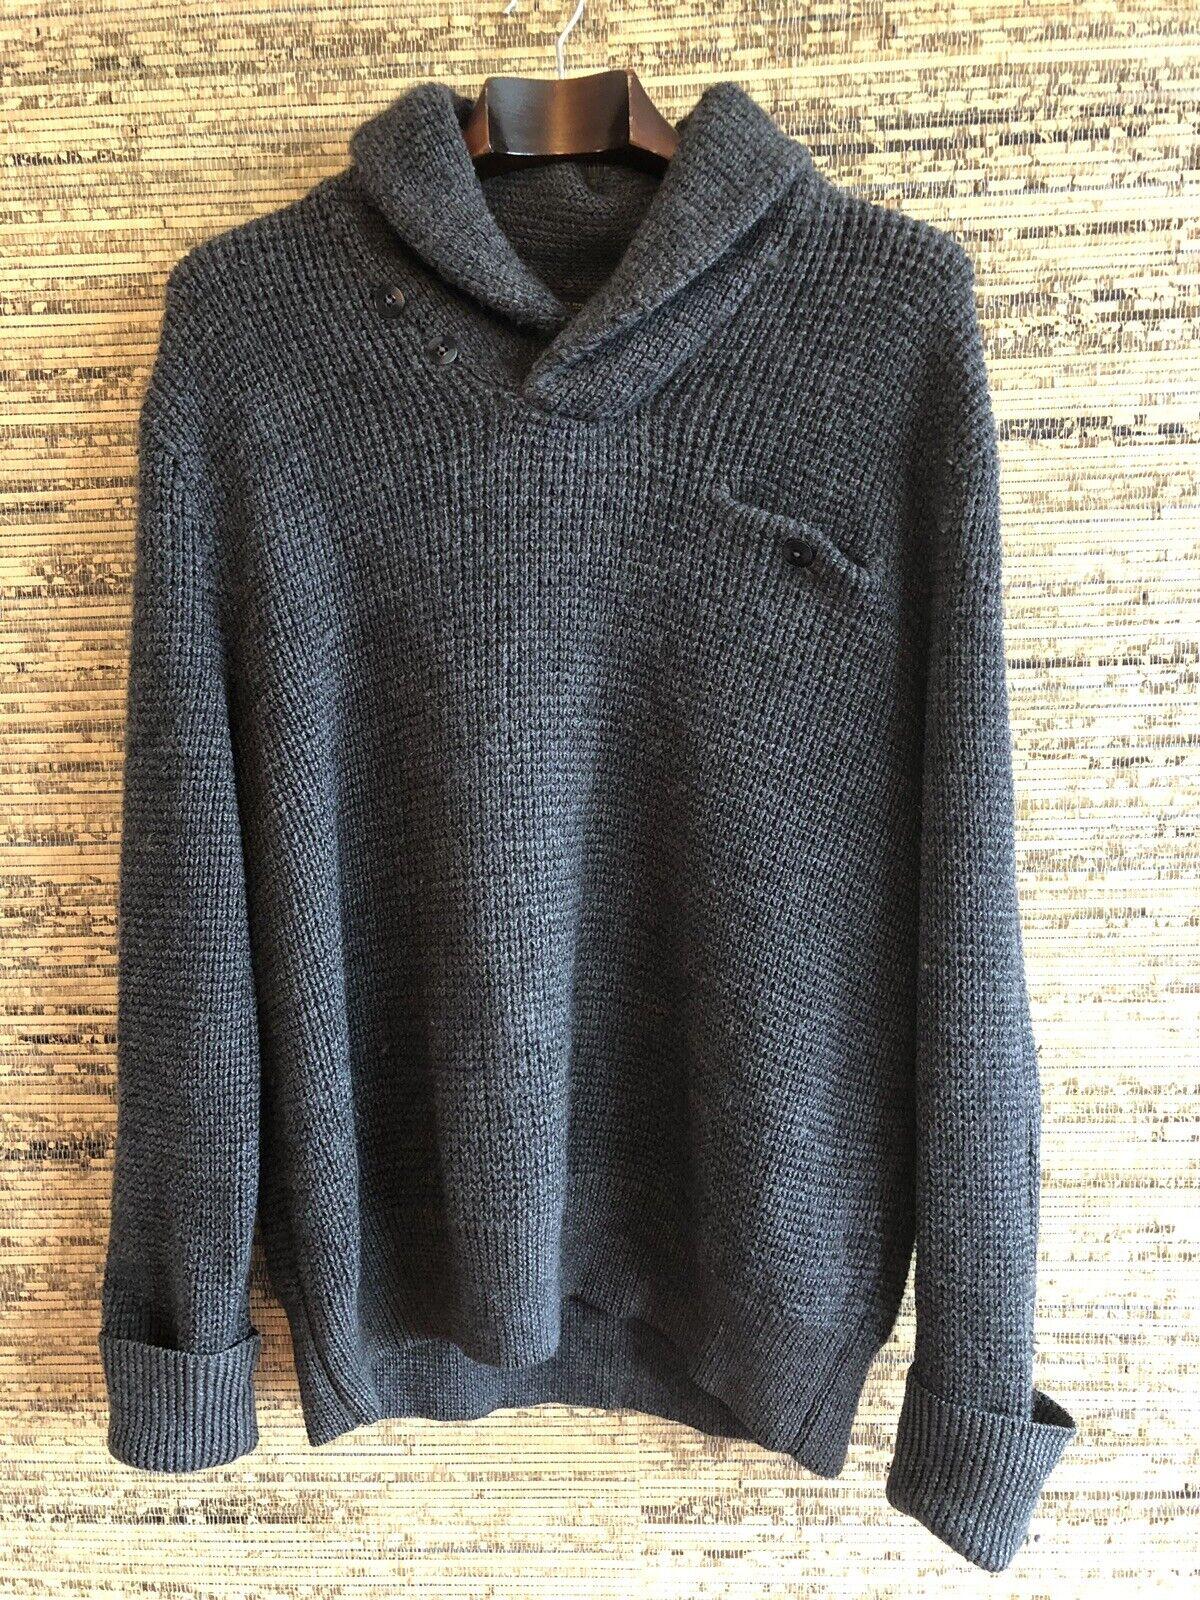 b3c0eda78 RRL Ralph Lauren Kitted Sweater Size XL nzsnxc18308-Jumpers ...